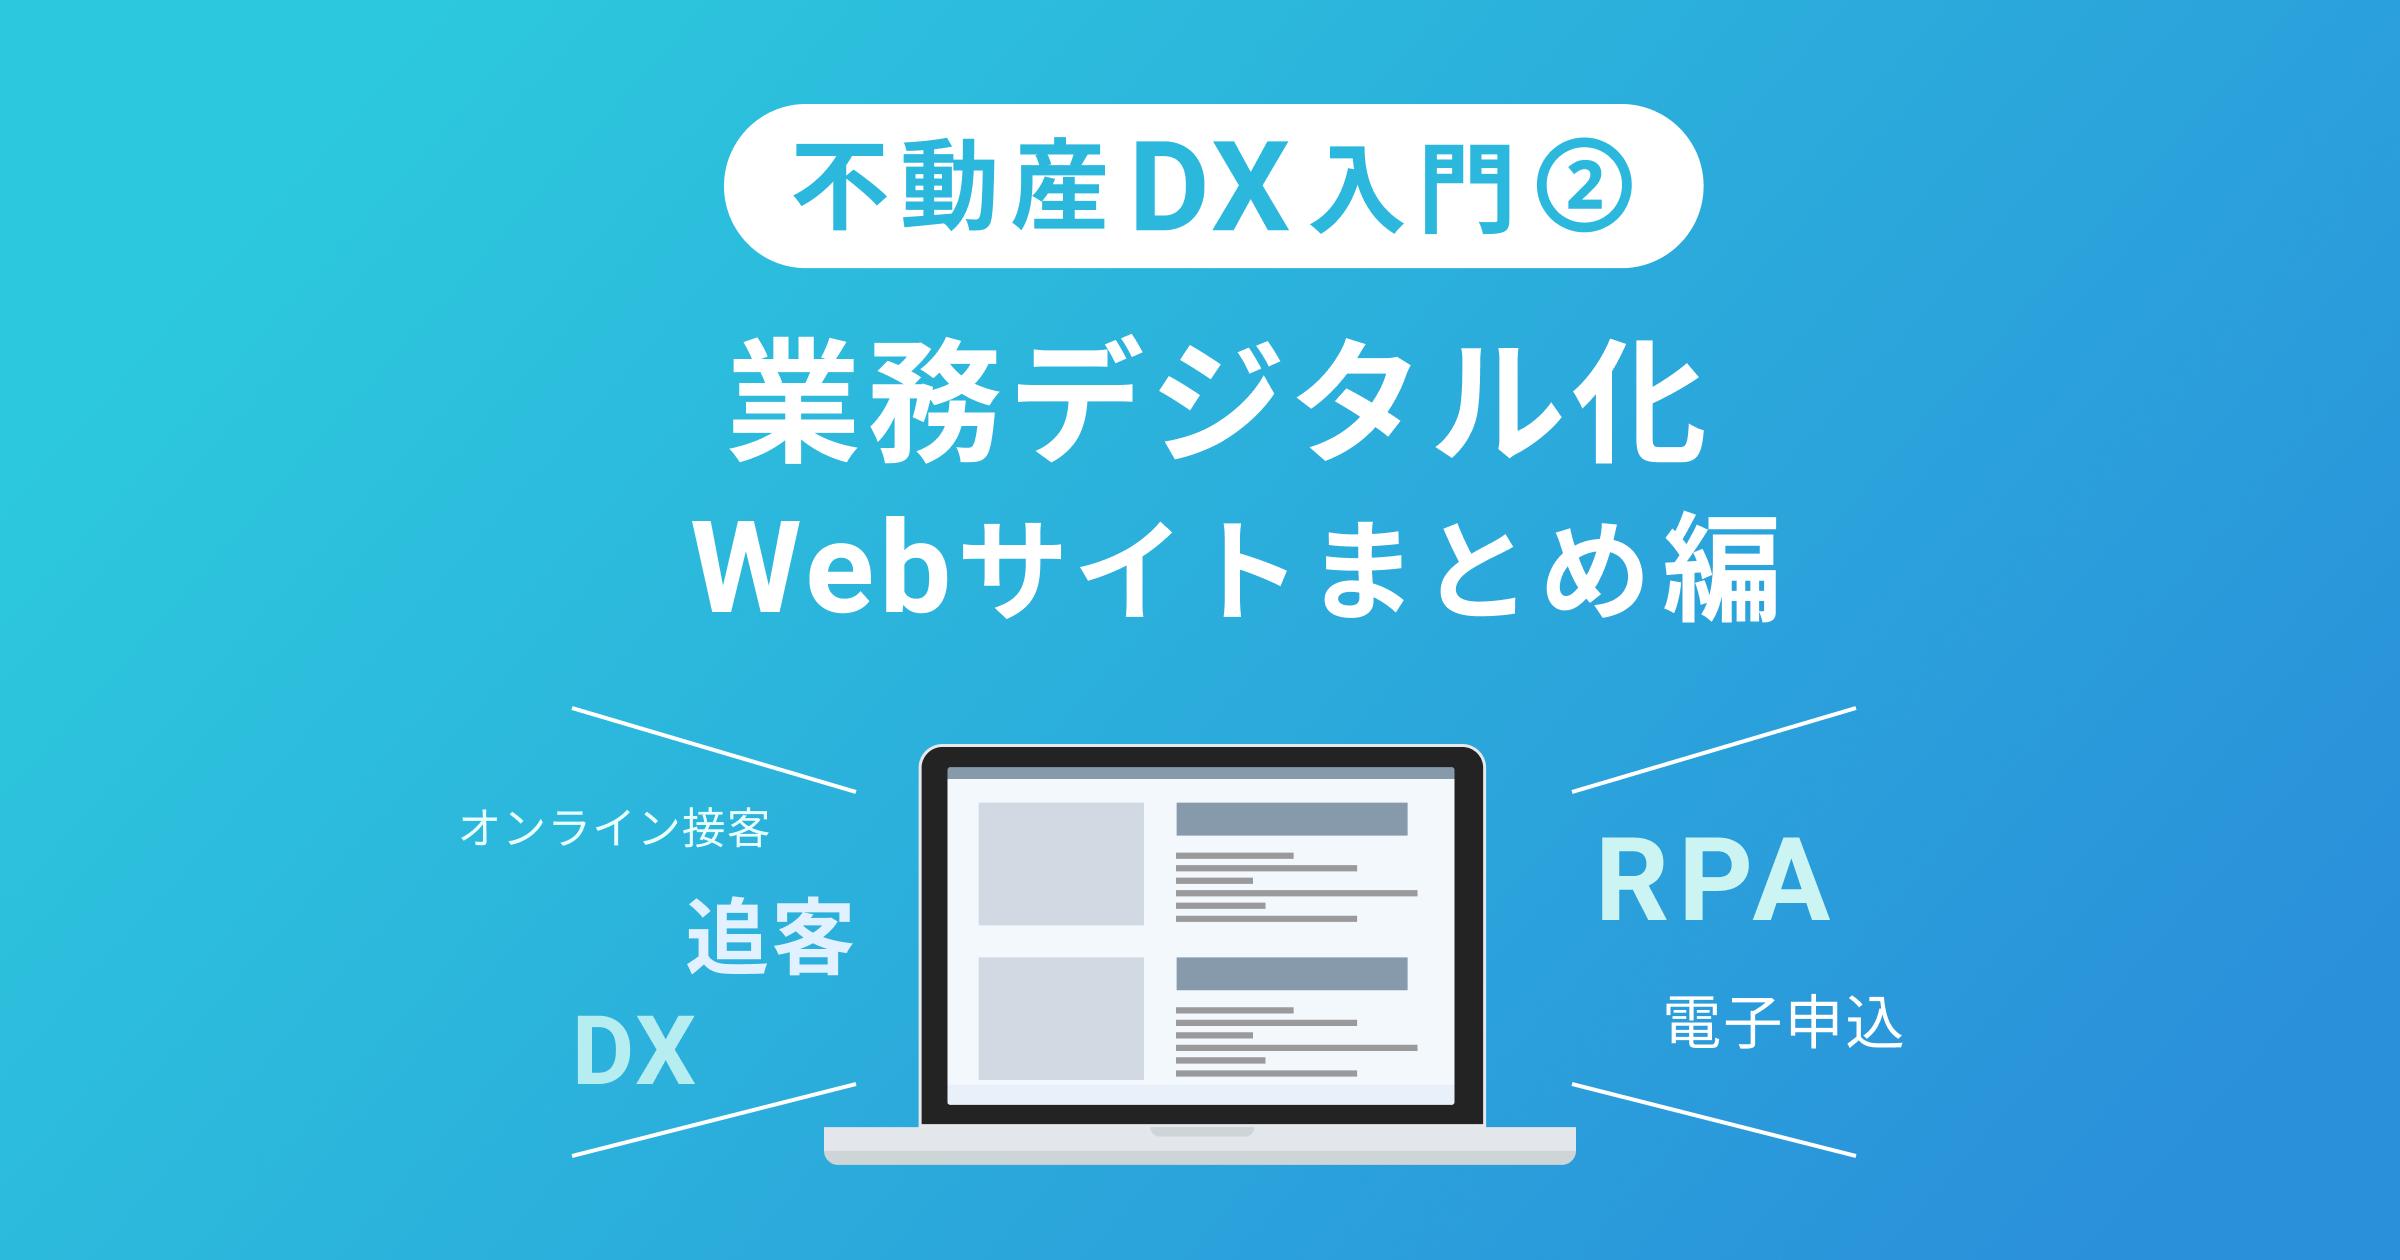 OGPImage_DX入門2_v1